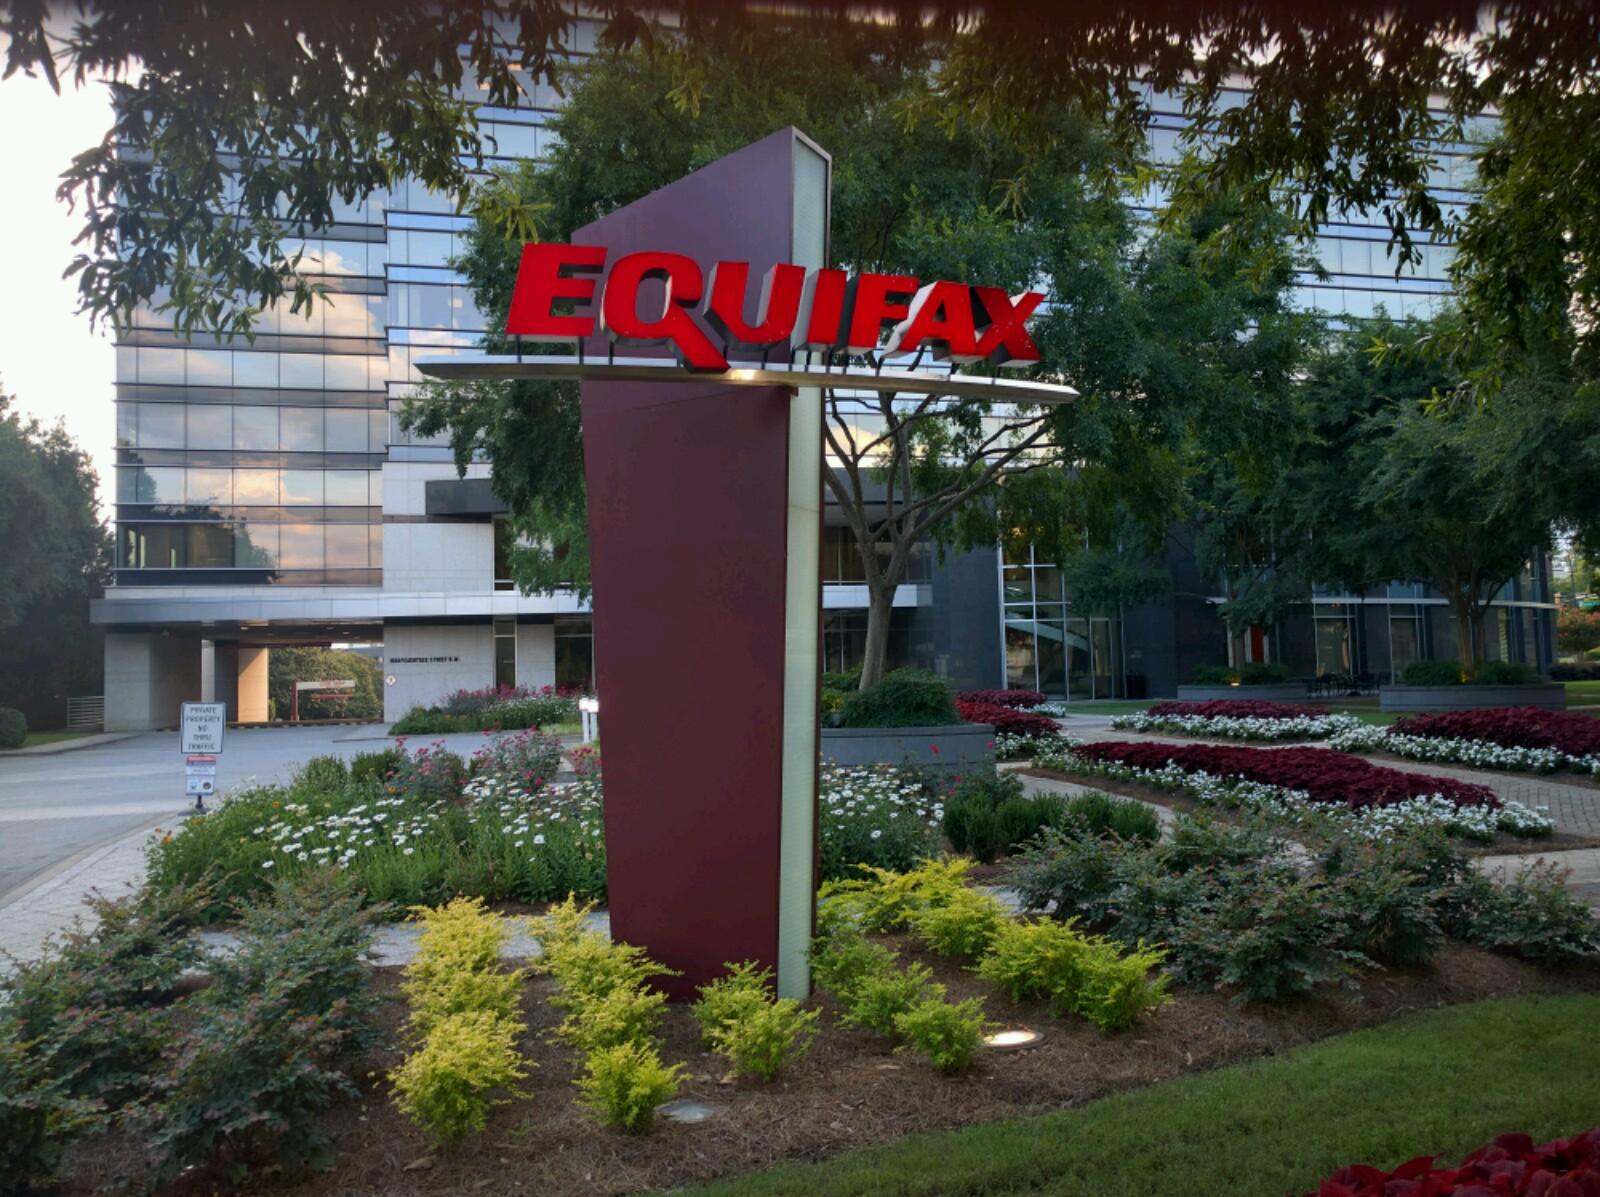 Entrance to Equifax's corporate headquarters in Atlanta, Georgia.